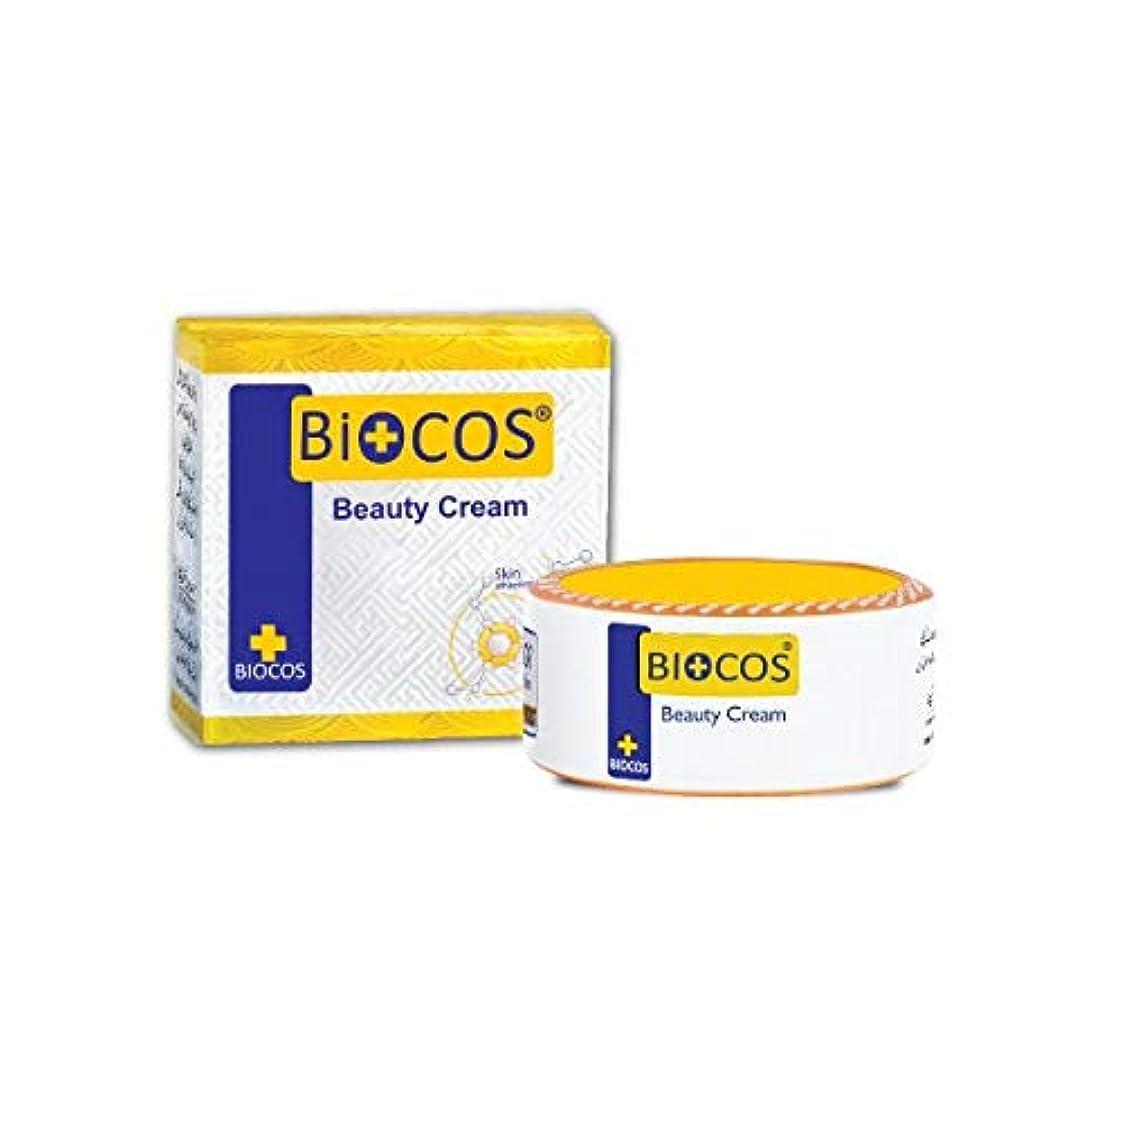 役割頼る系統的Biocos Beauty Cream & Emergency Serum Original Import from Pakistan